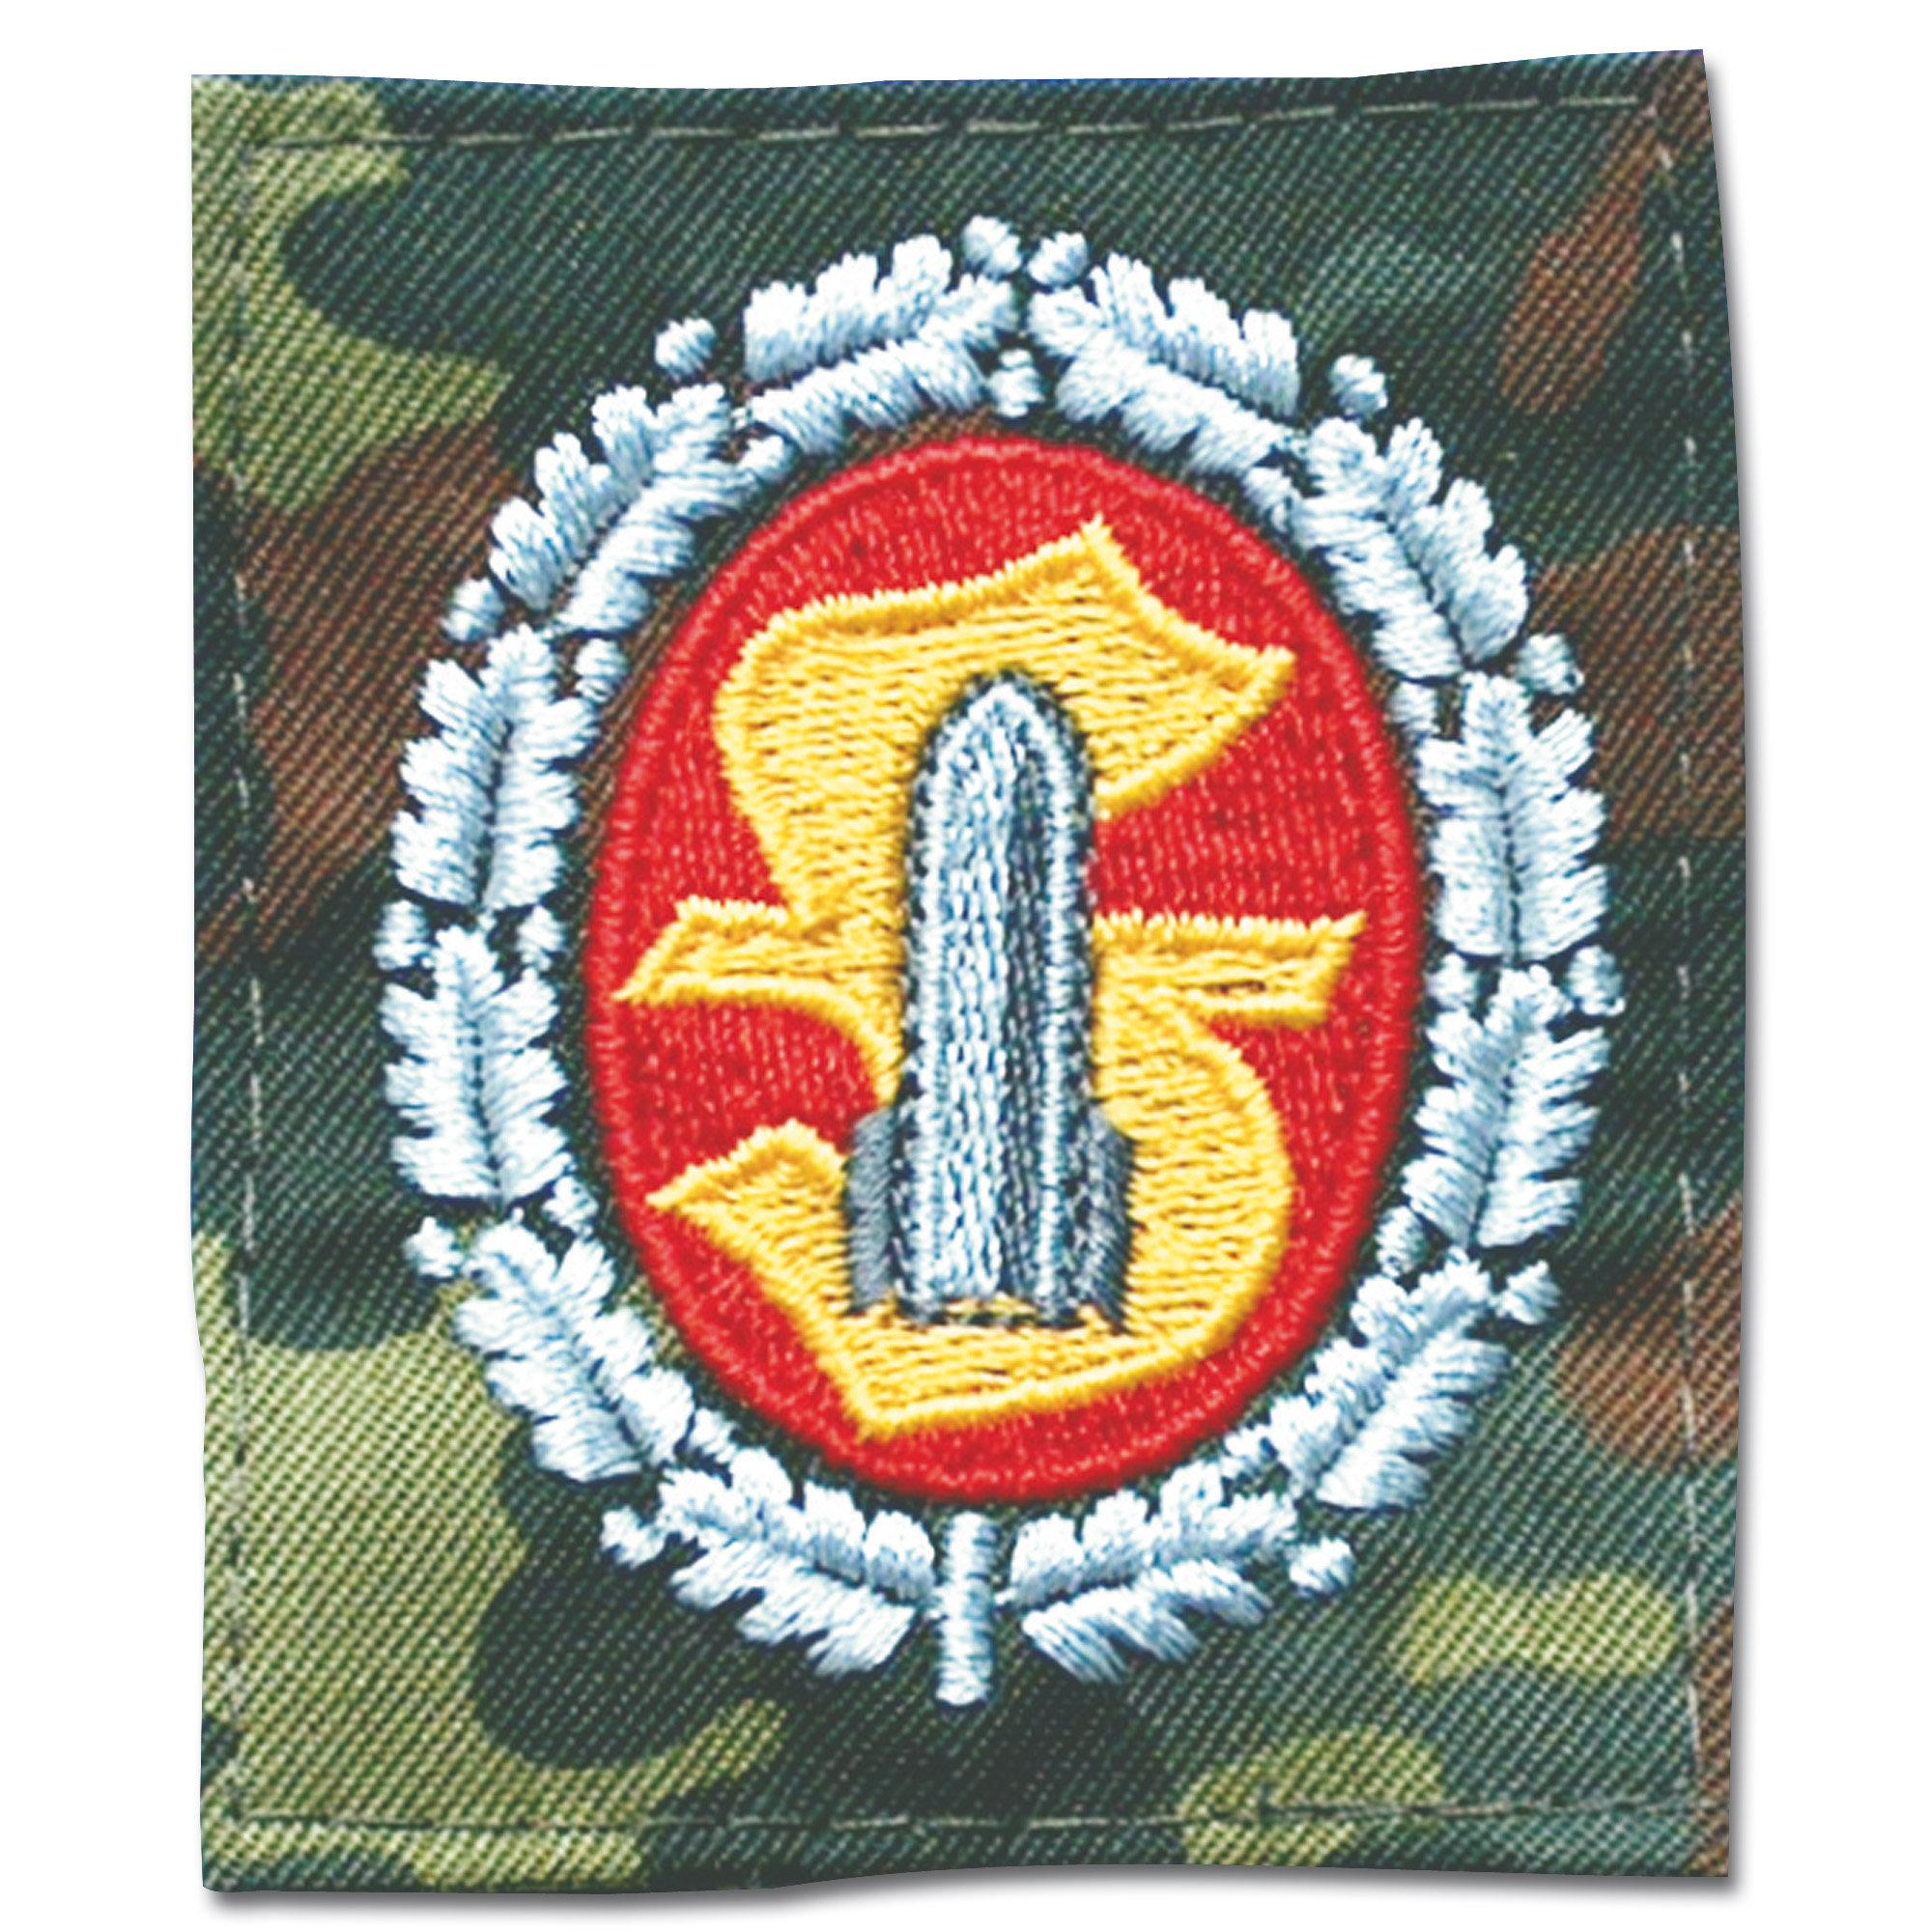 Insignia ammunition personal textile flecktarn/full color